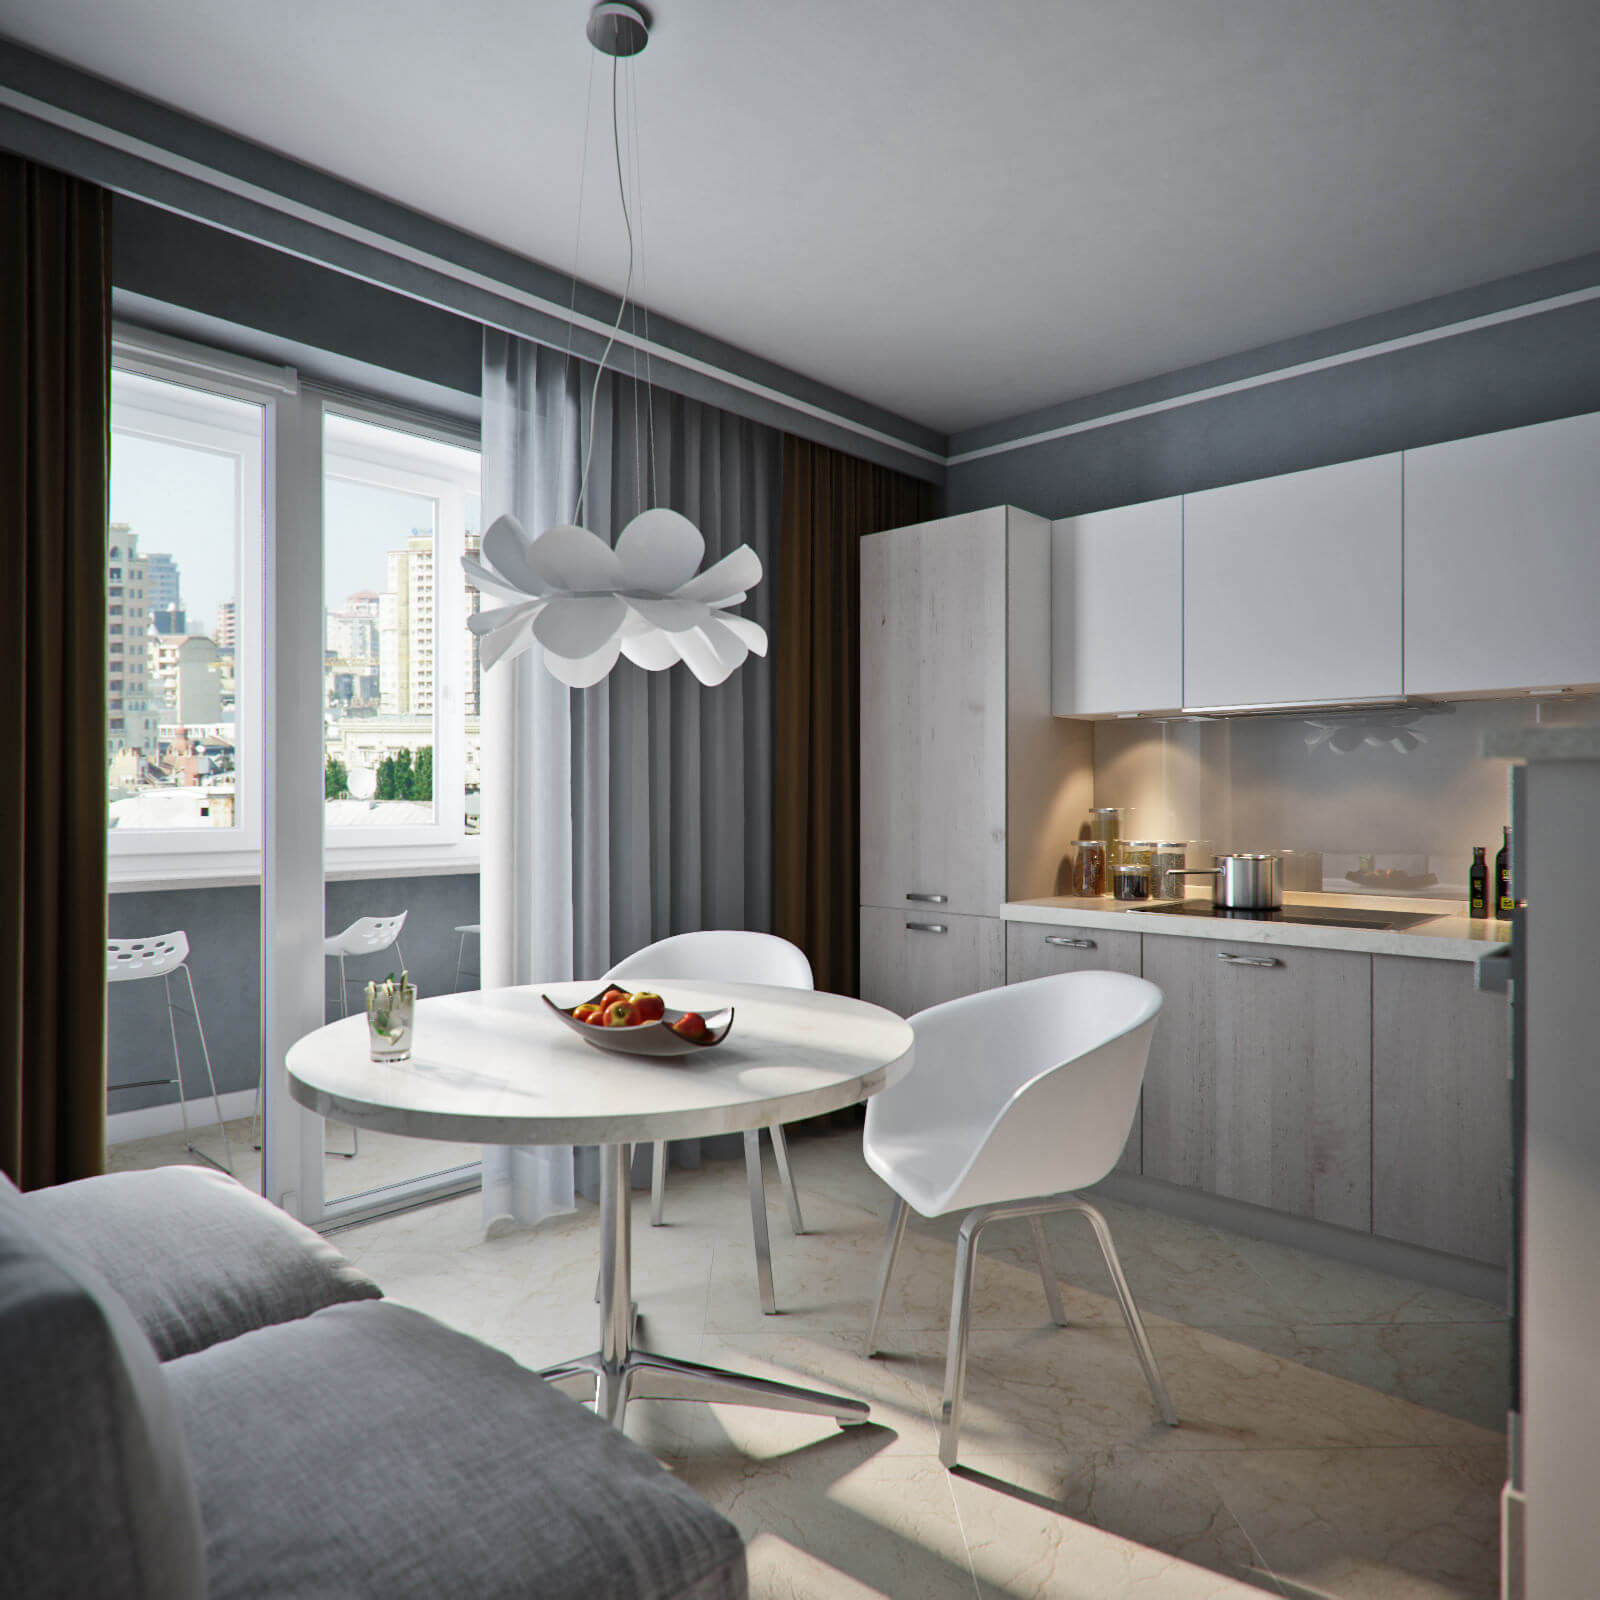 образец дизайн проекта квартиры